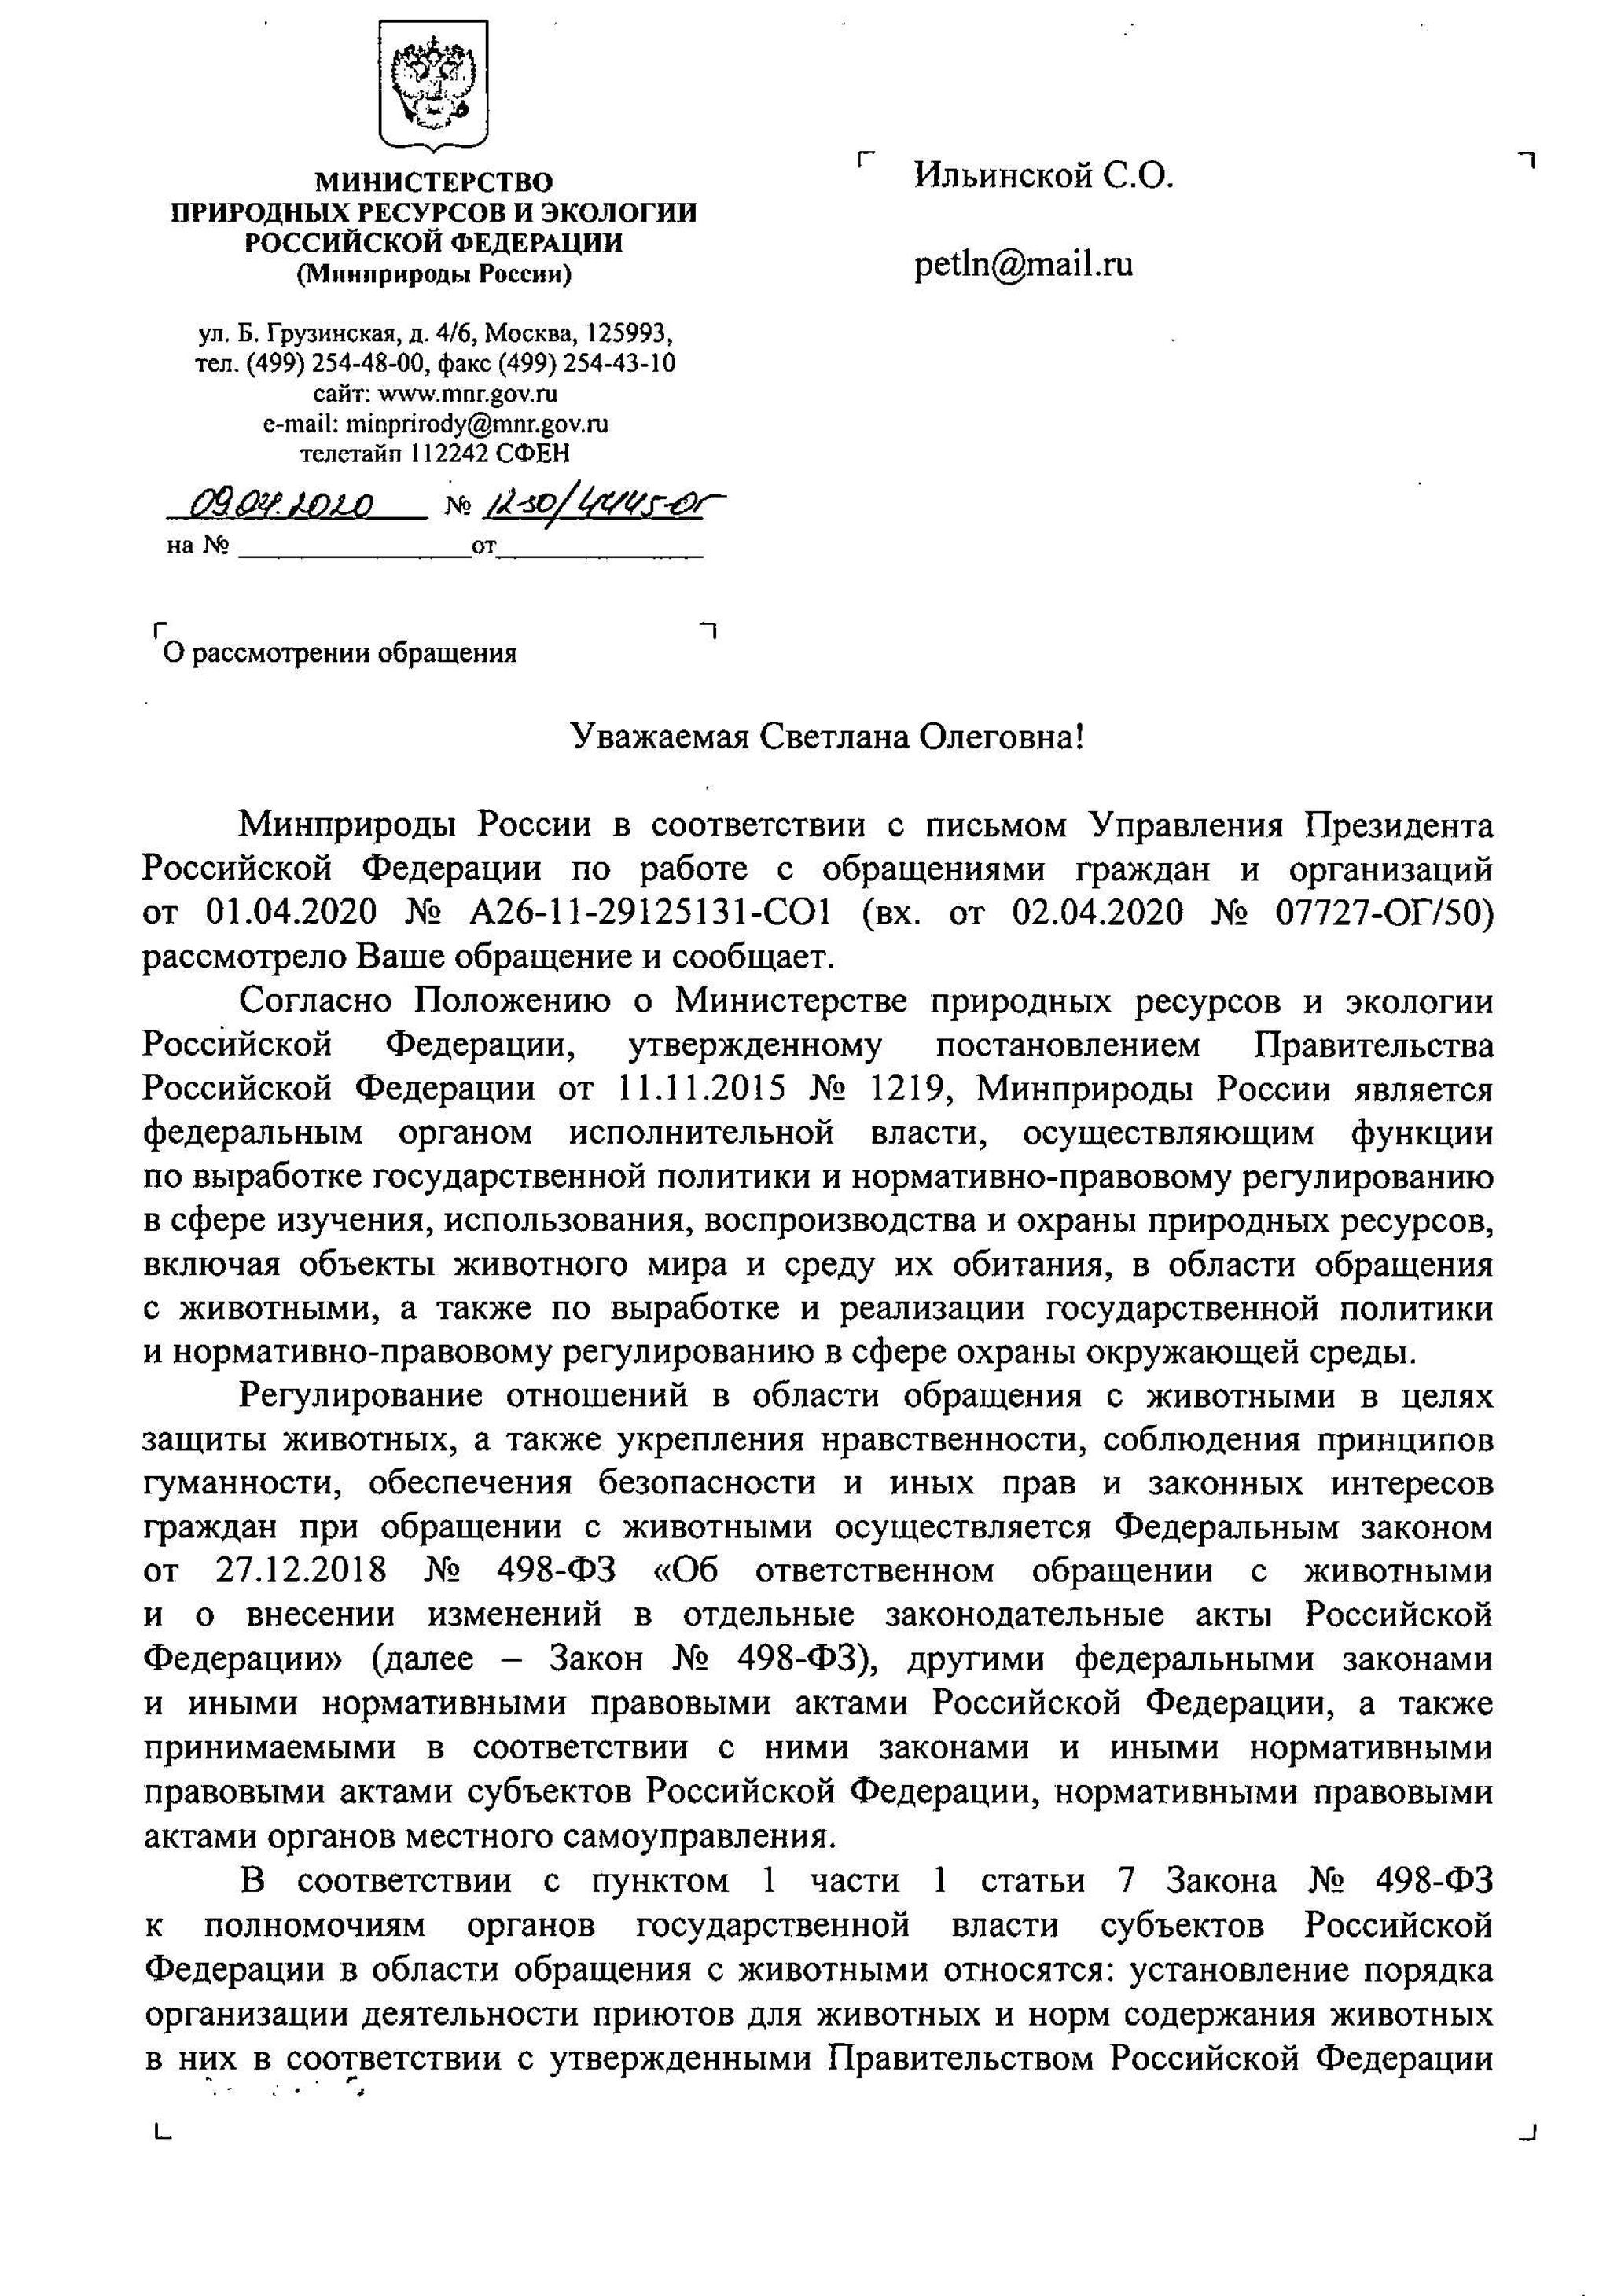 https://cs10.pikabu.ru/post_img/big/2020/04/12/5/158667794717187723.jpg